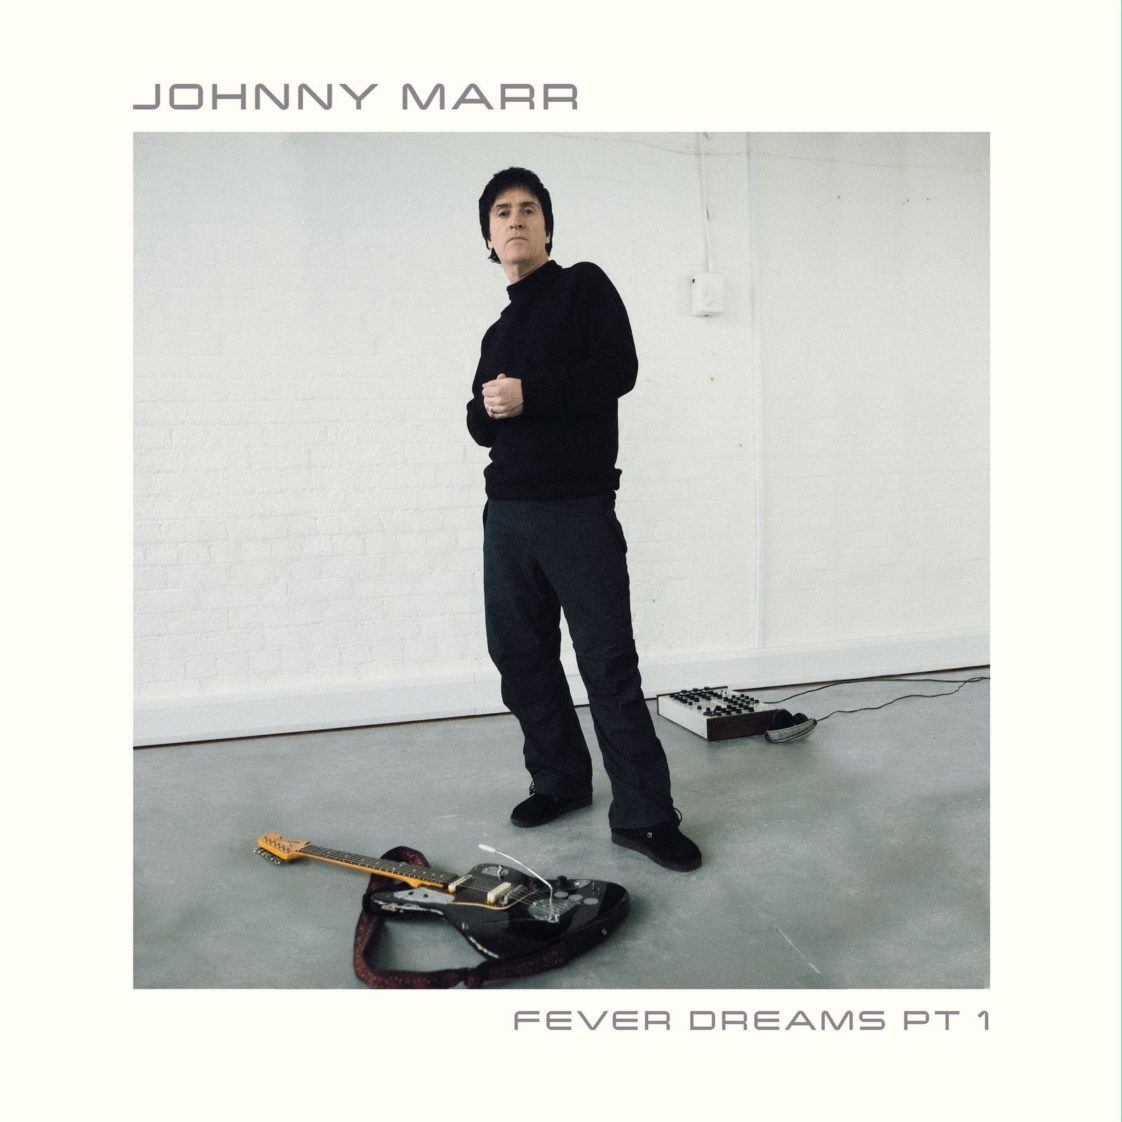 Johnny Marr - Fever Dreams pt.1